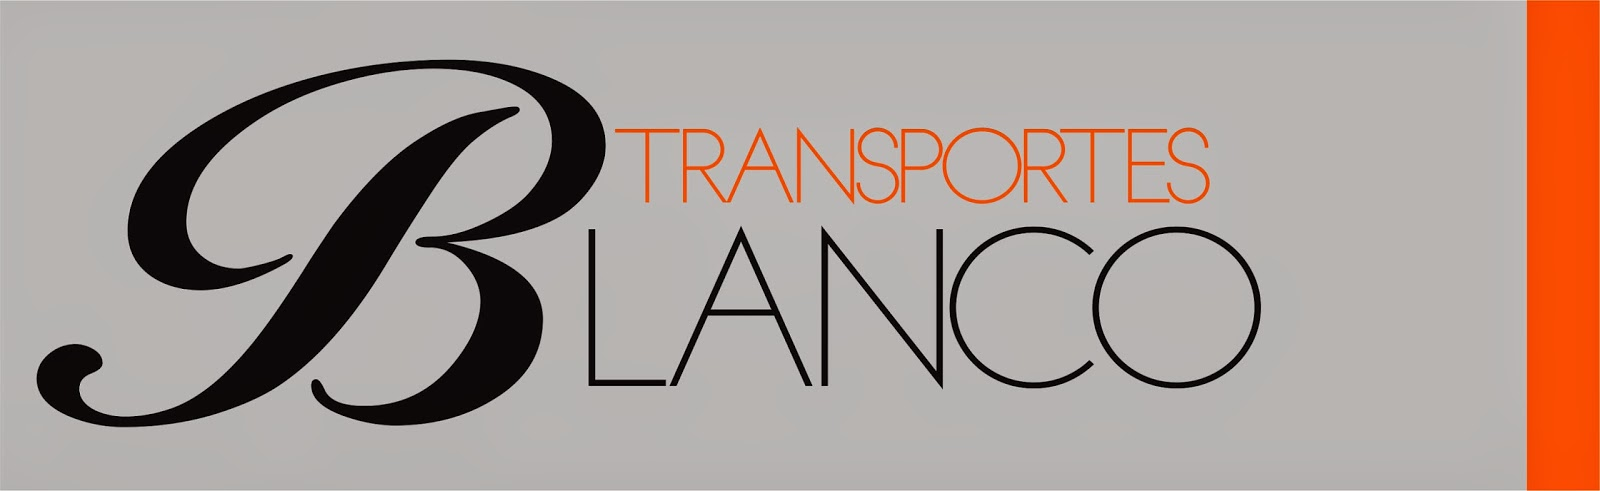 http://onibus-mania.blogspot.com.br/search/label/Transportes%20Blanco%20%28RJ%29